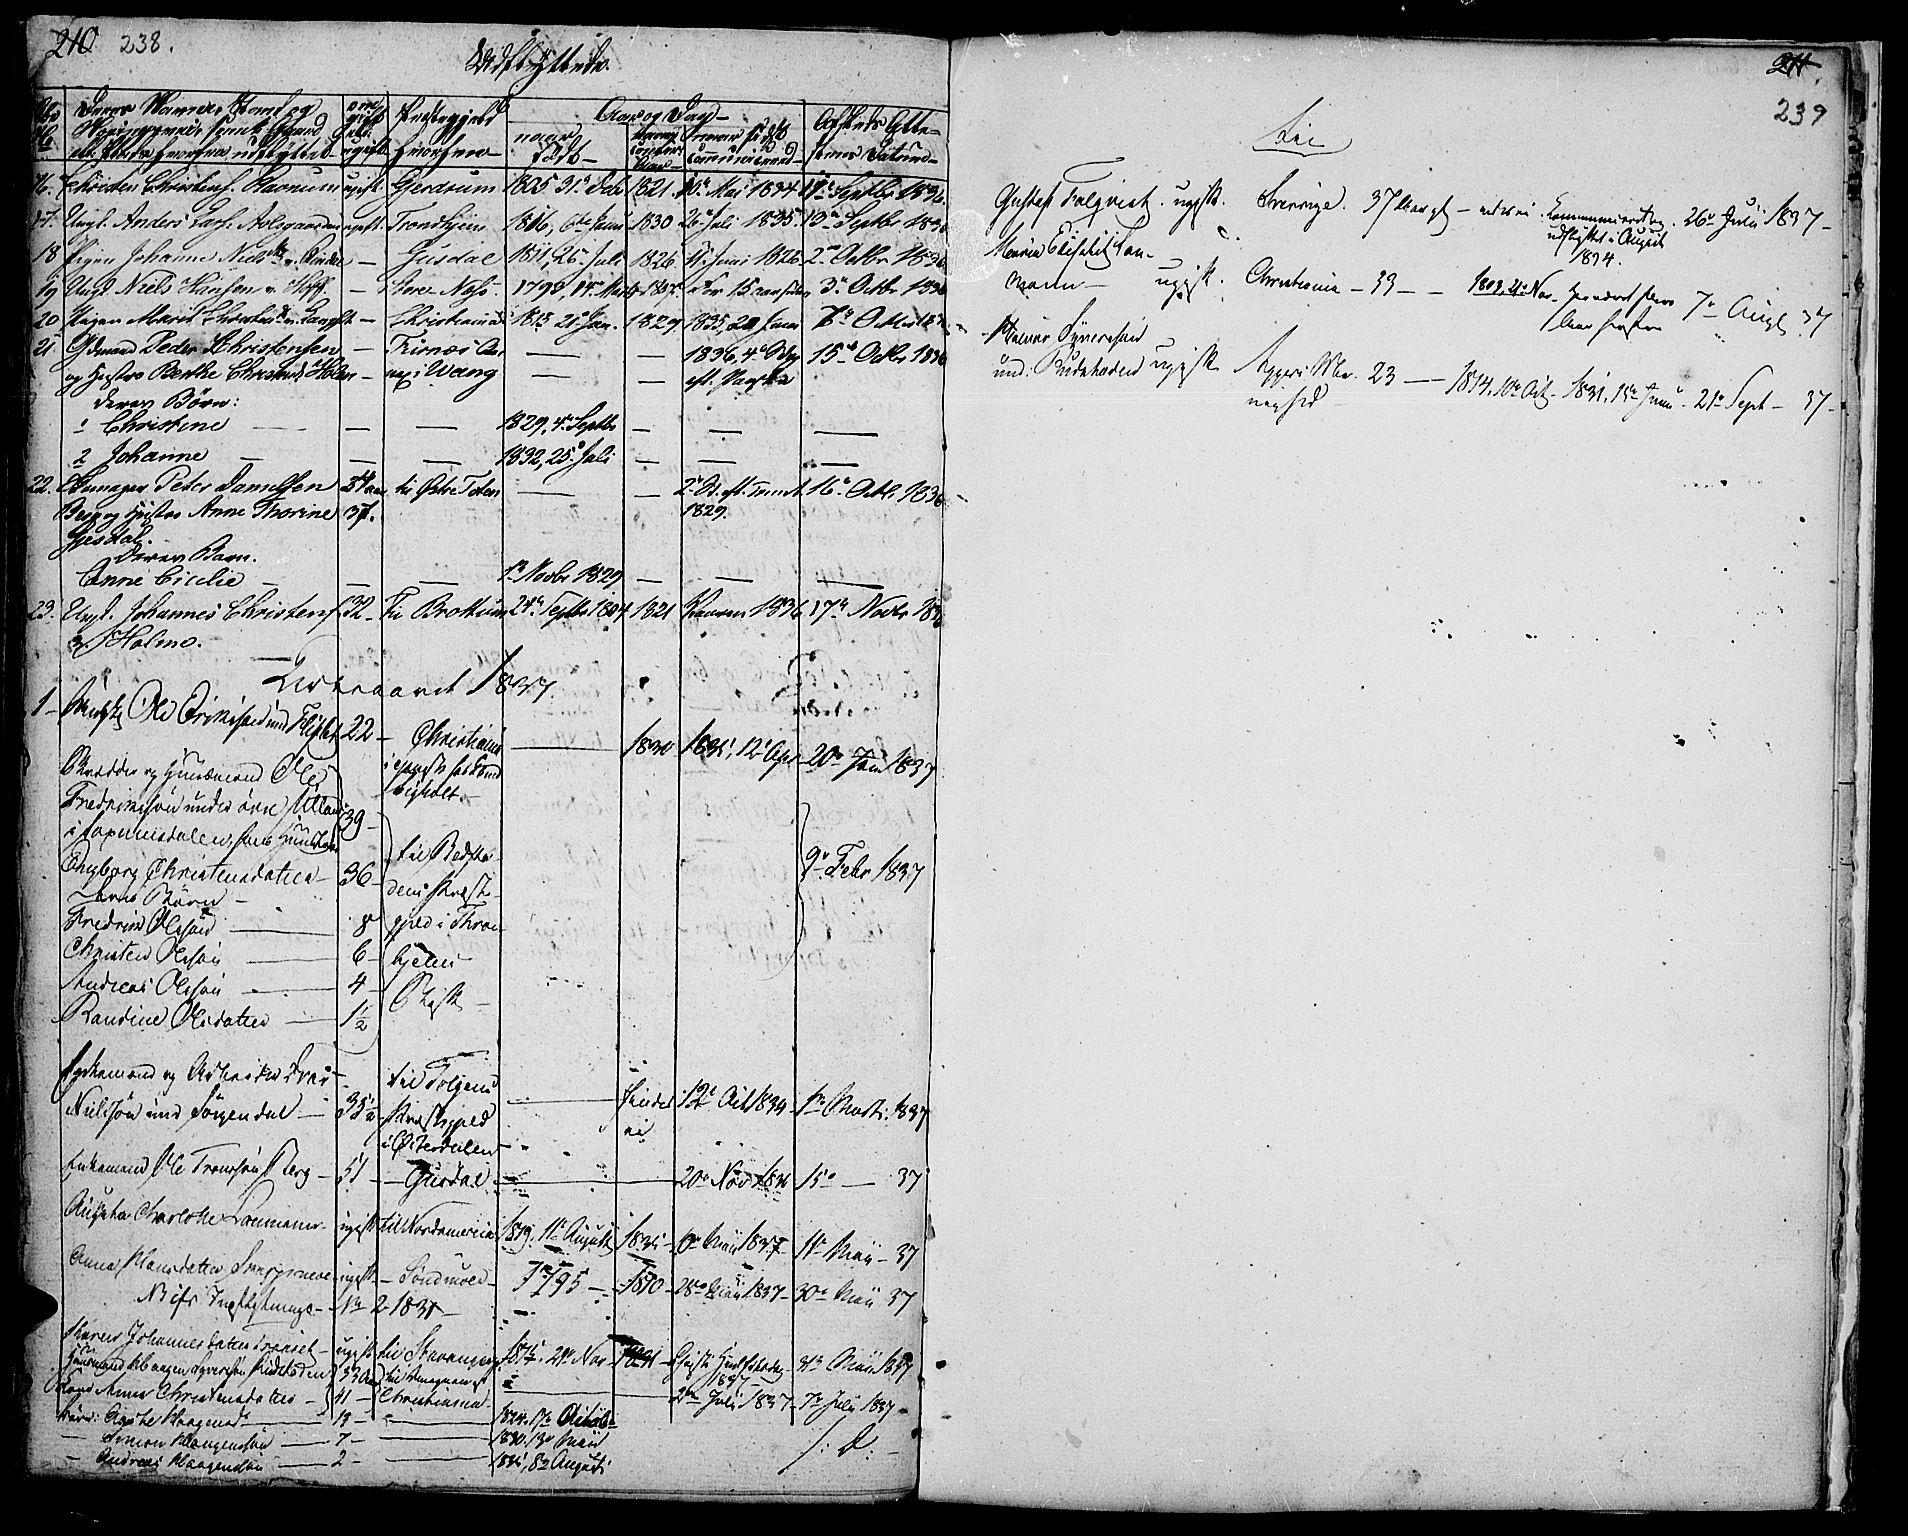 SAH, Fåberg prestekontor, Ministerialbok nr. 4, 1833-1837, s. 238-239